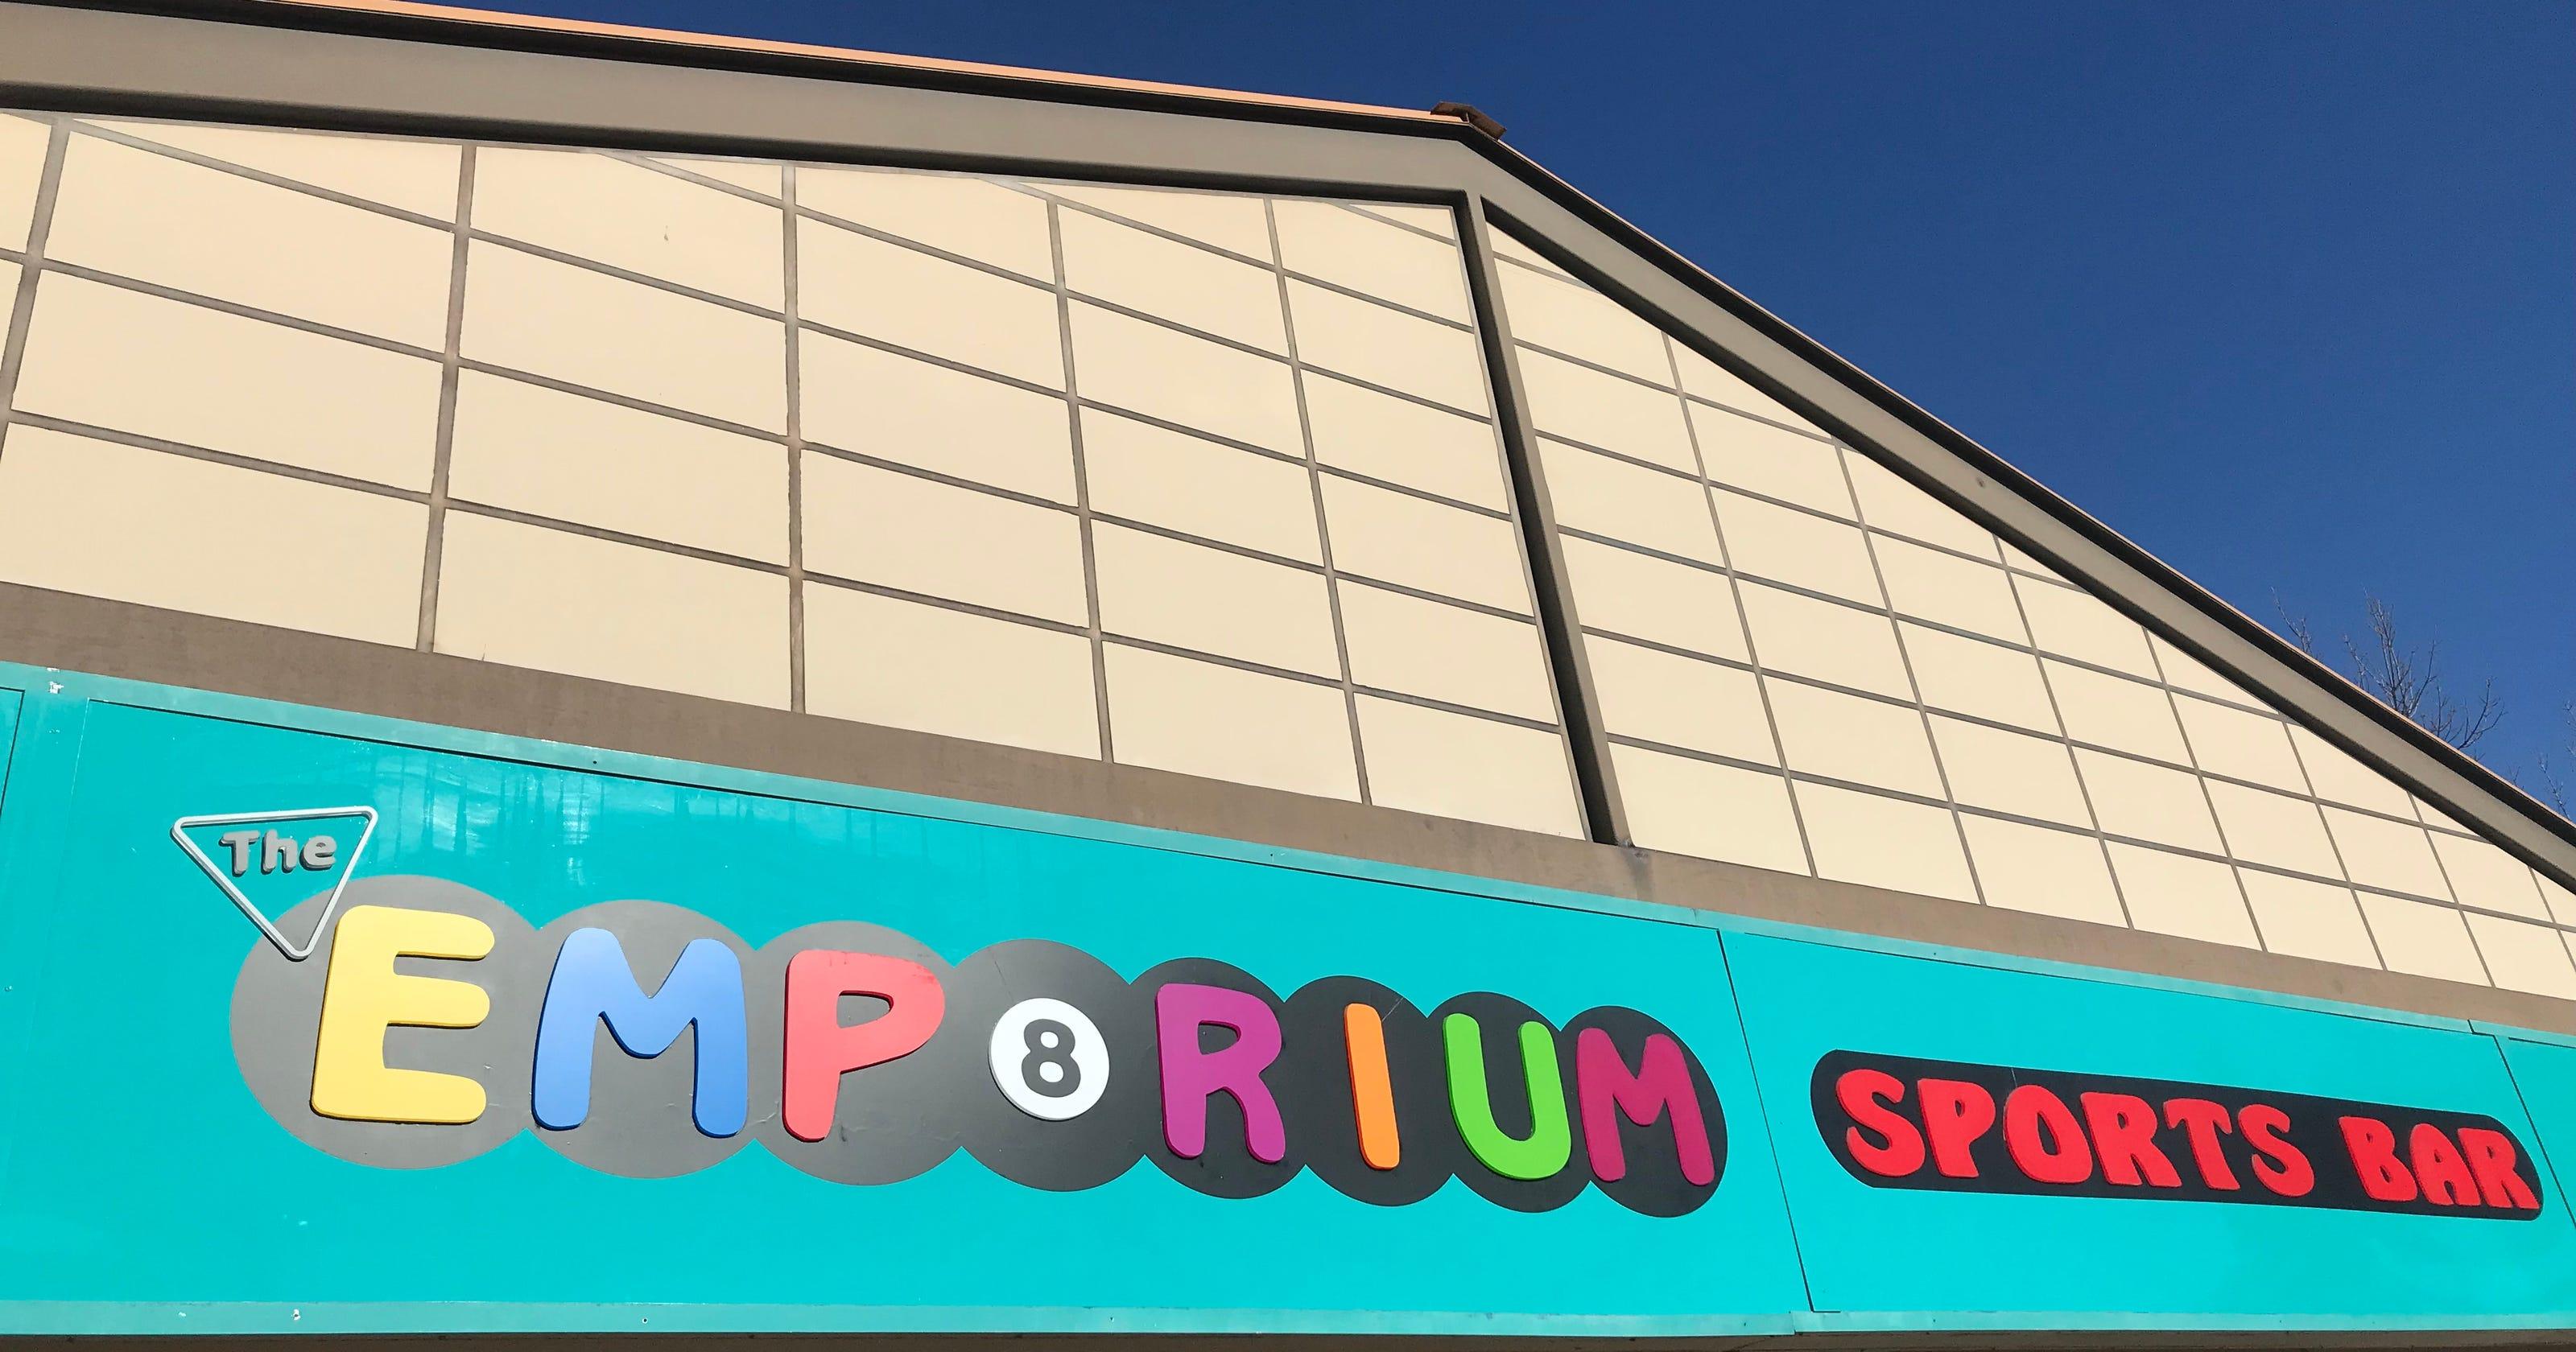 Emporium Sports Bar opens in Fort Collins